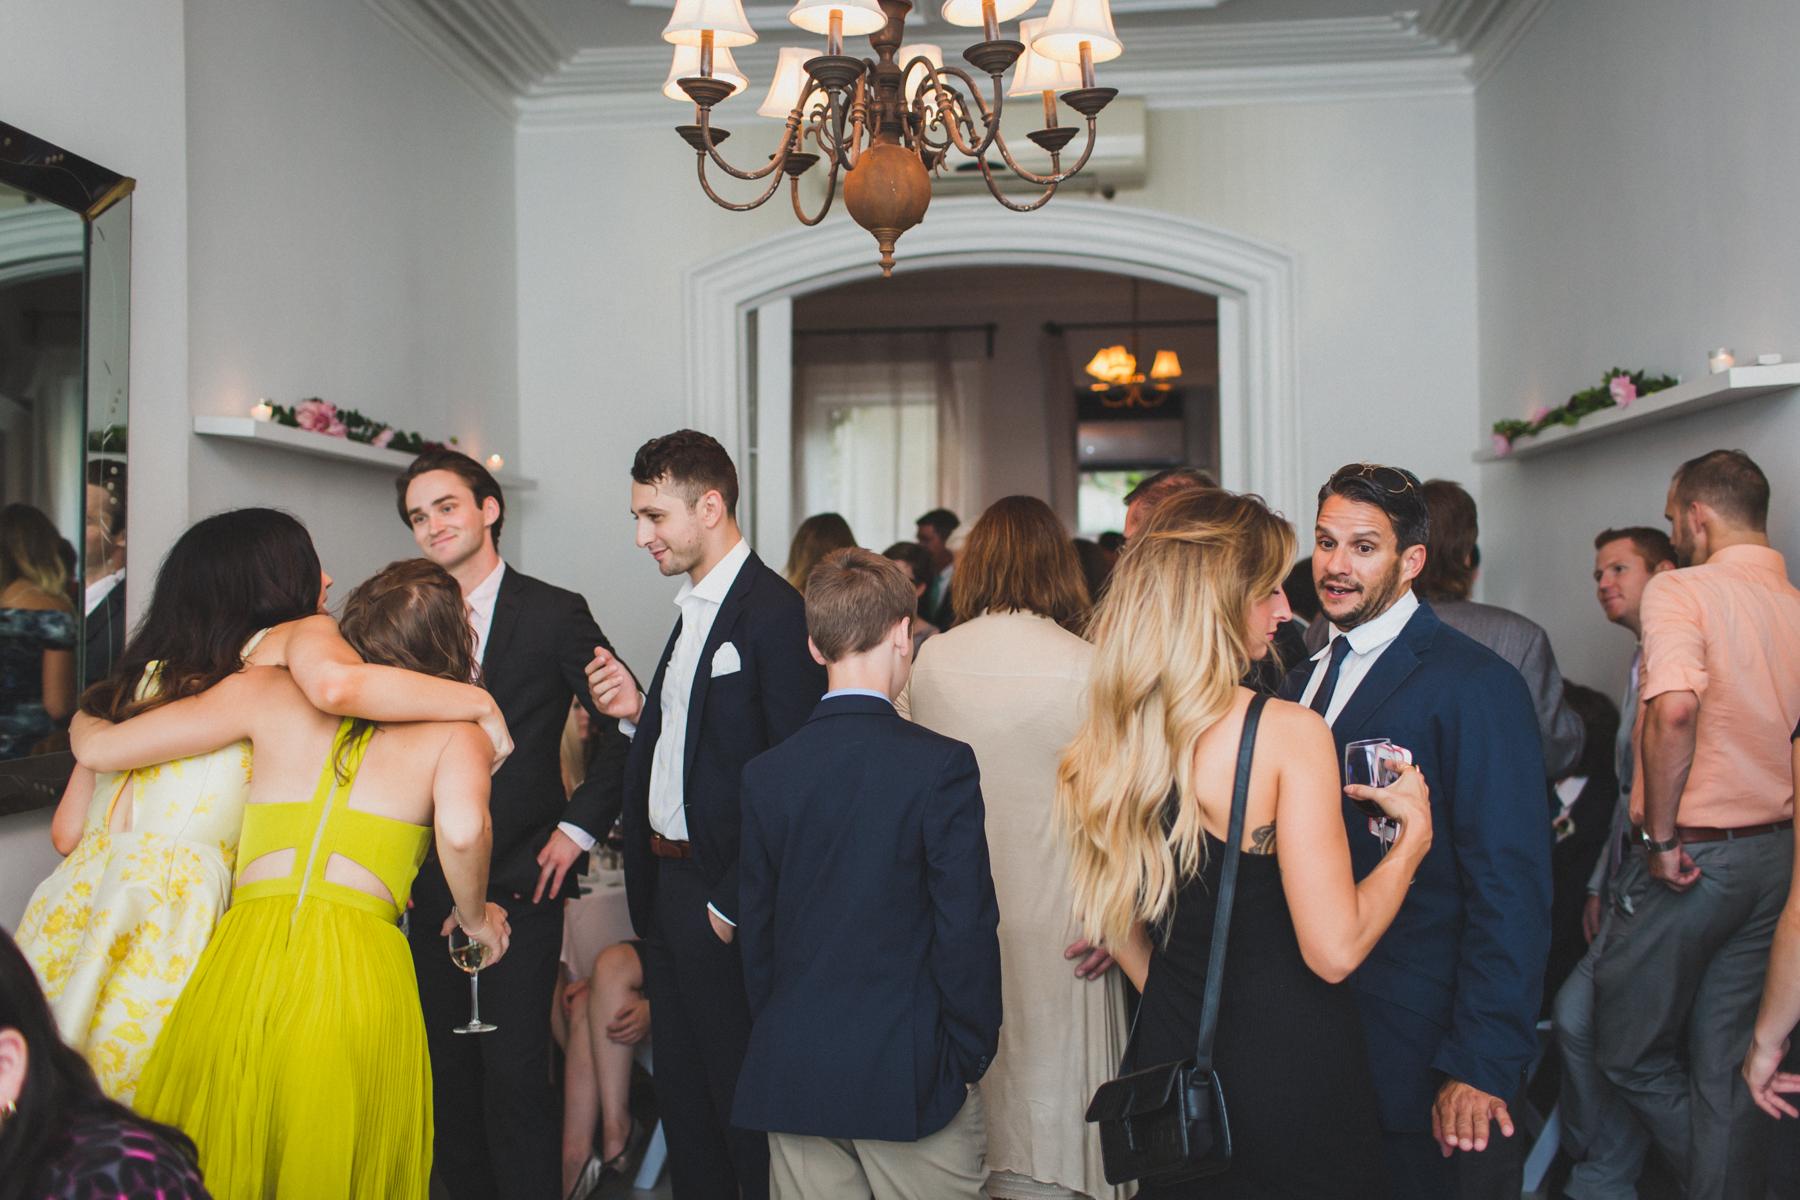 ICI-Restaurant-Fort-Greene-Brooklyn-Intimate-Documentary-Wedding-Photography-Elvira-Kalviste-64.jpg